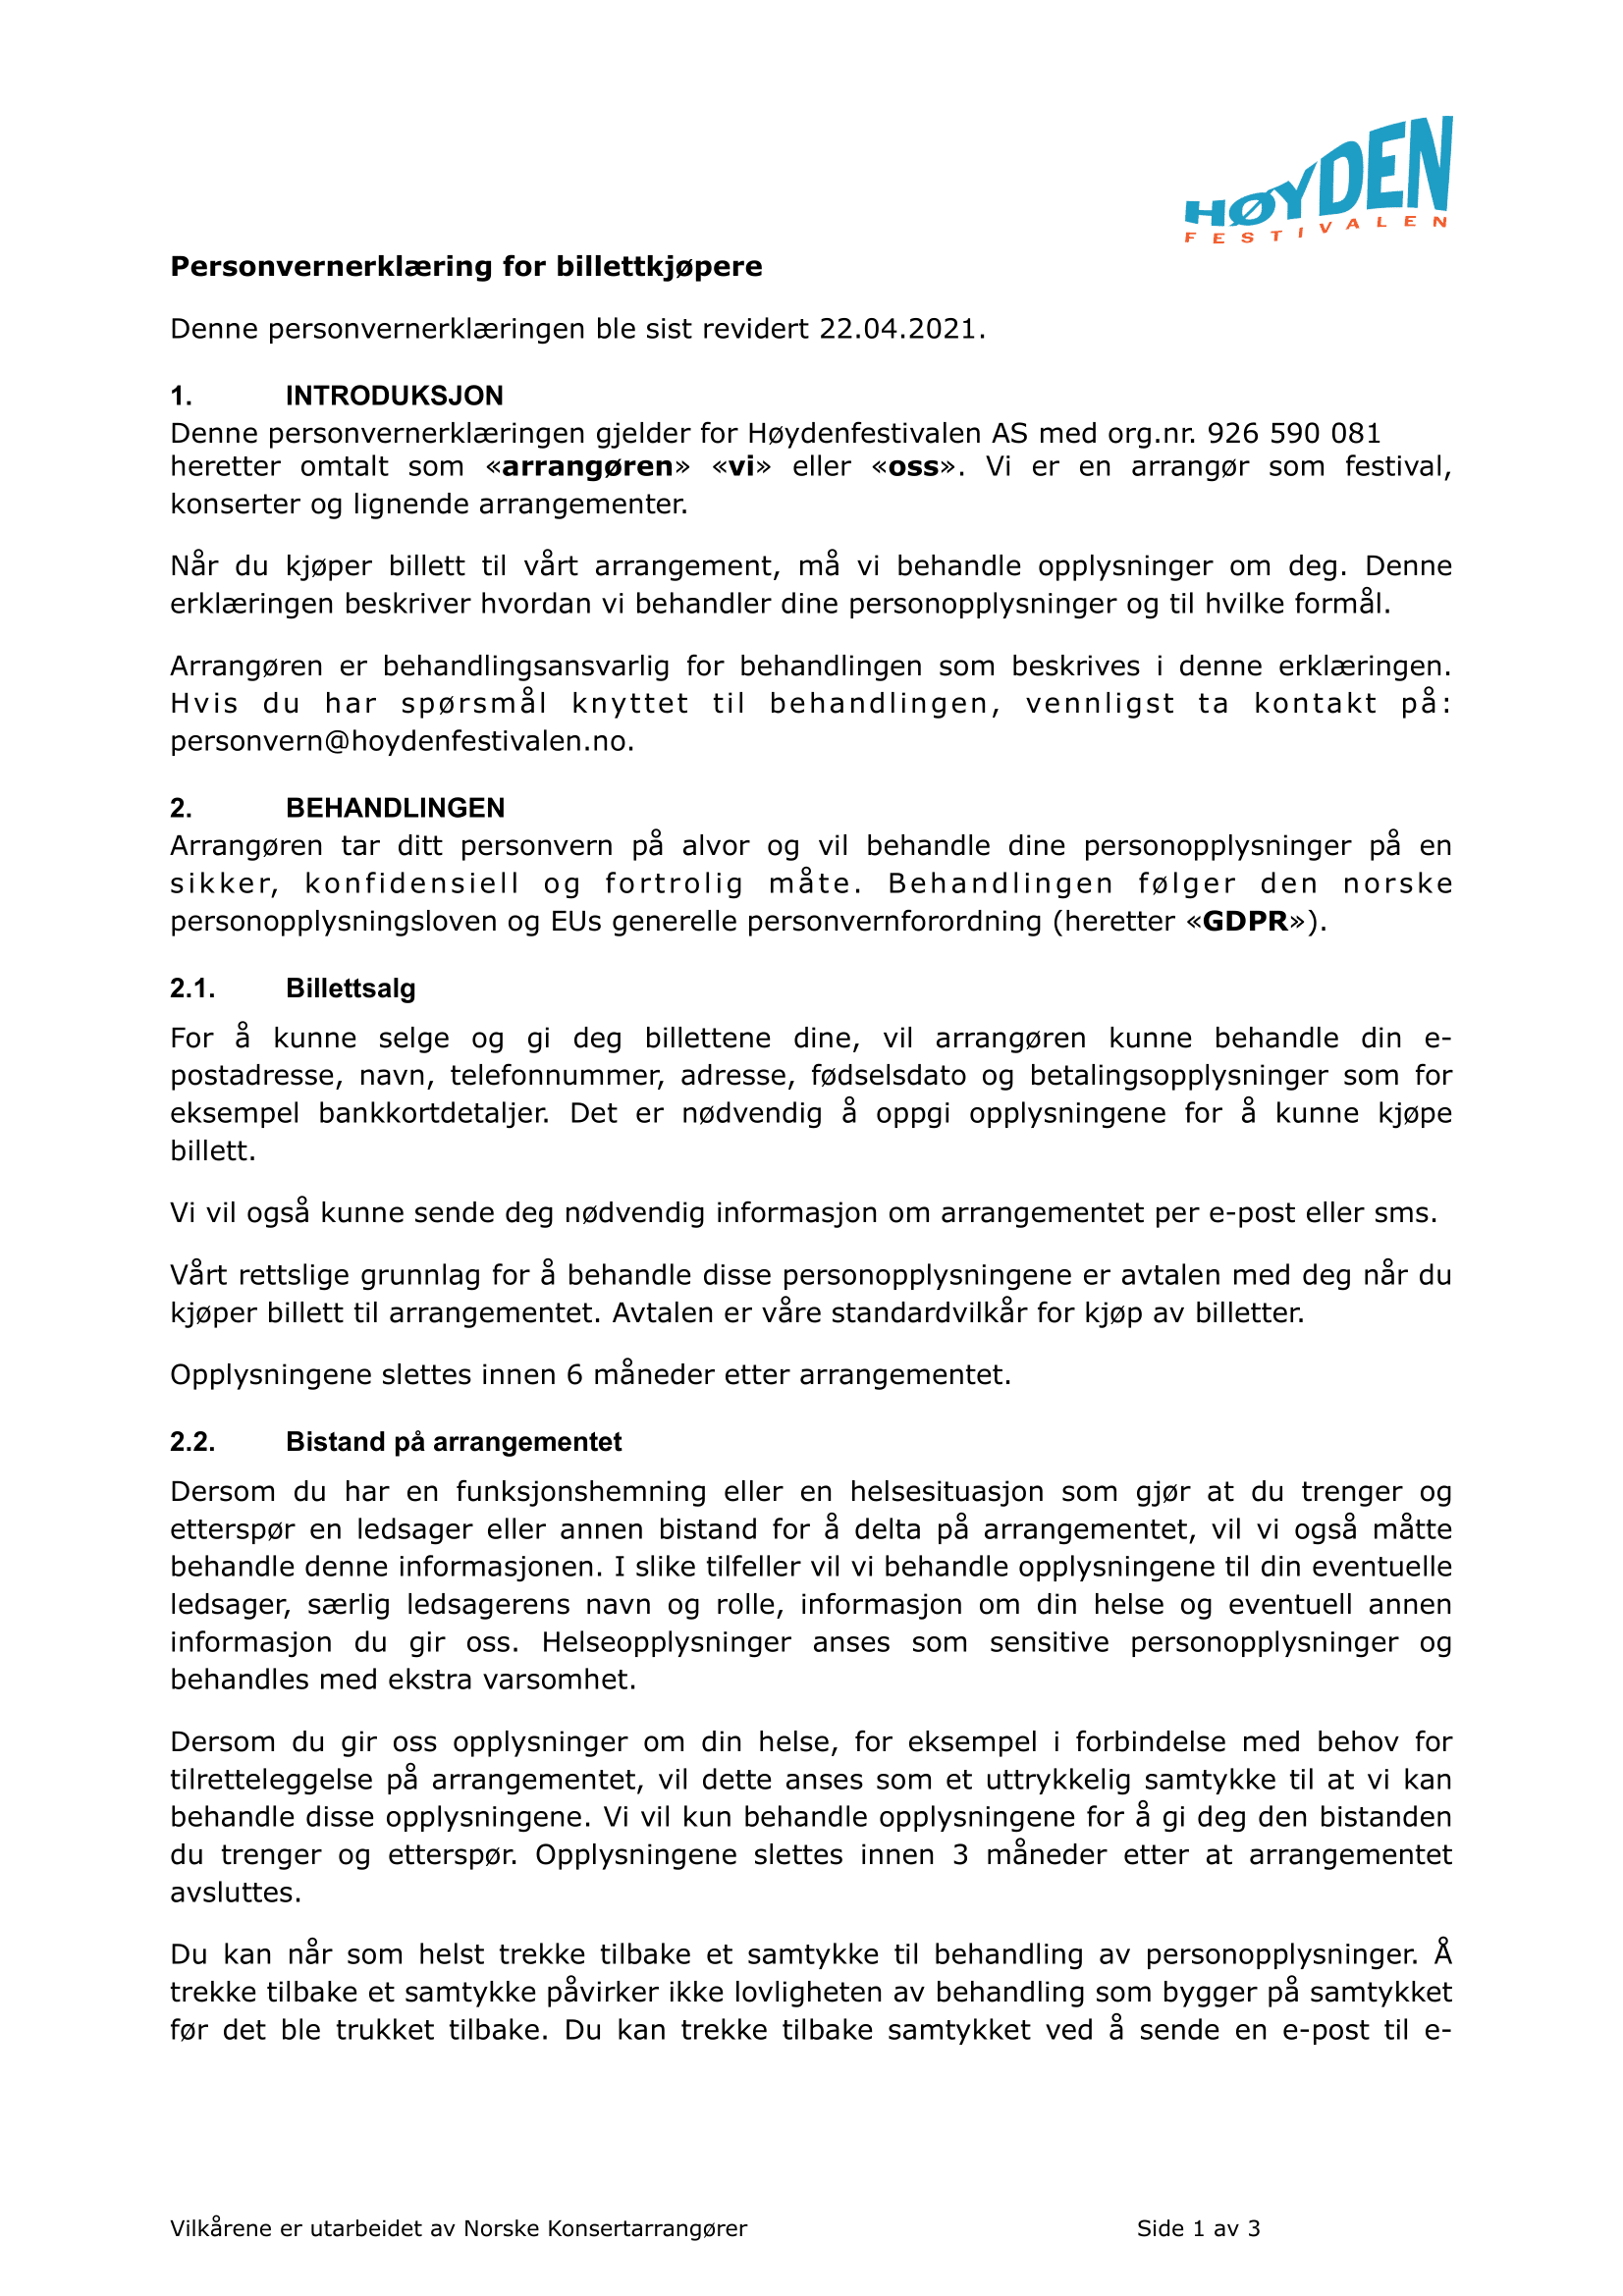 Personvernserklæring side 1.